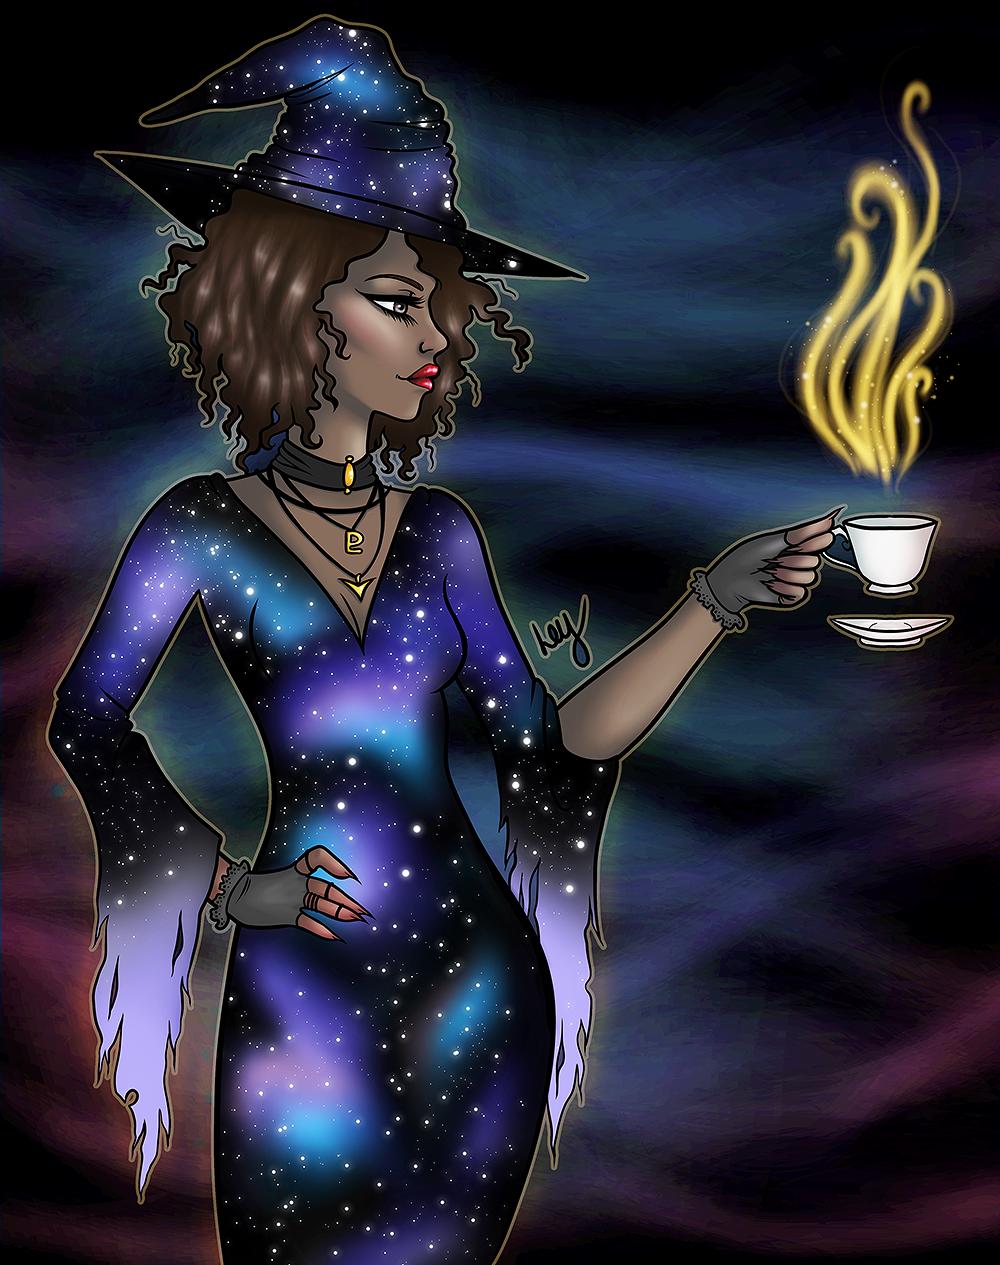 Galaxy Witch by leys